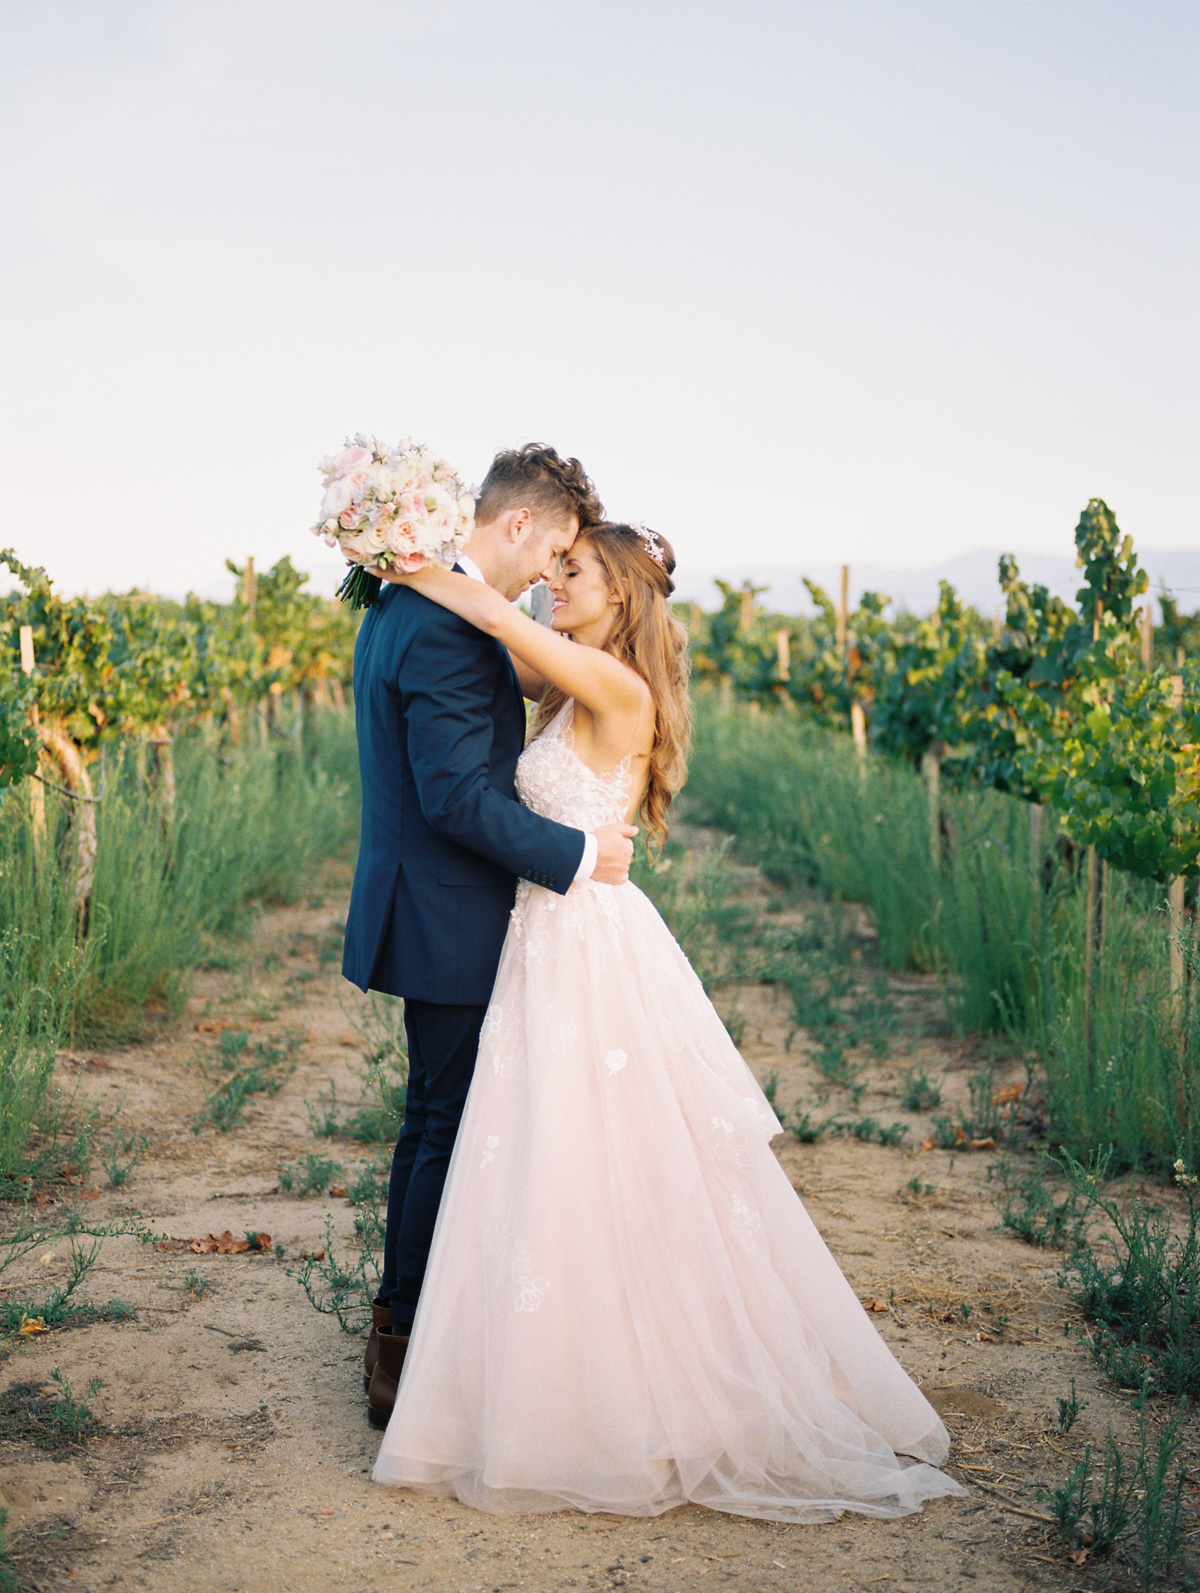 Harrison & Jocelyne's gorgeous Temecula wedding day at Wiens Family Cellars captured by Temecula wedding photographers Betsy & John